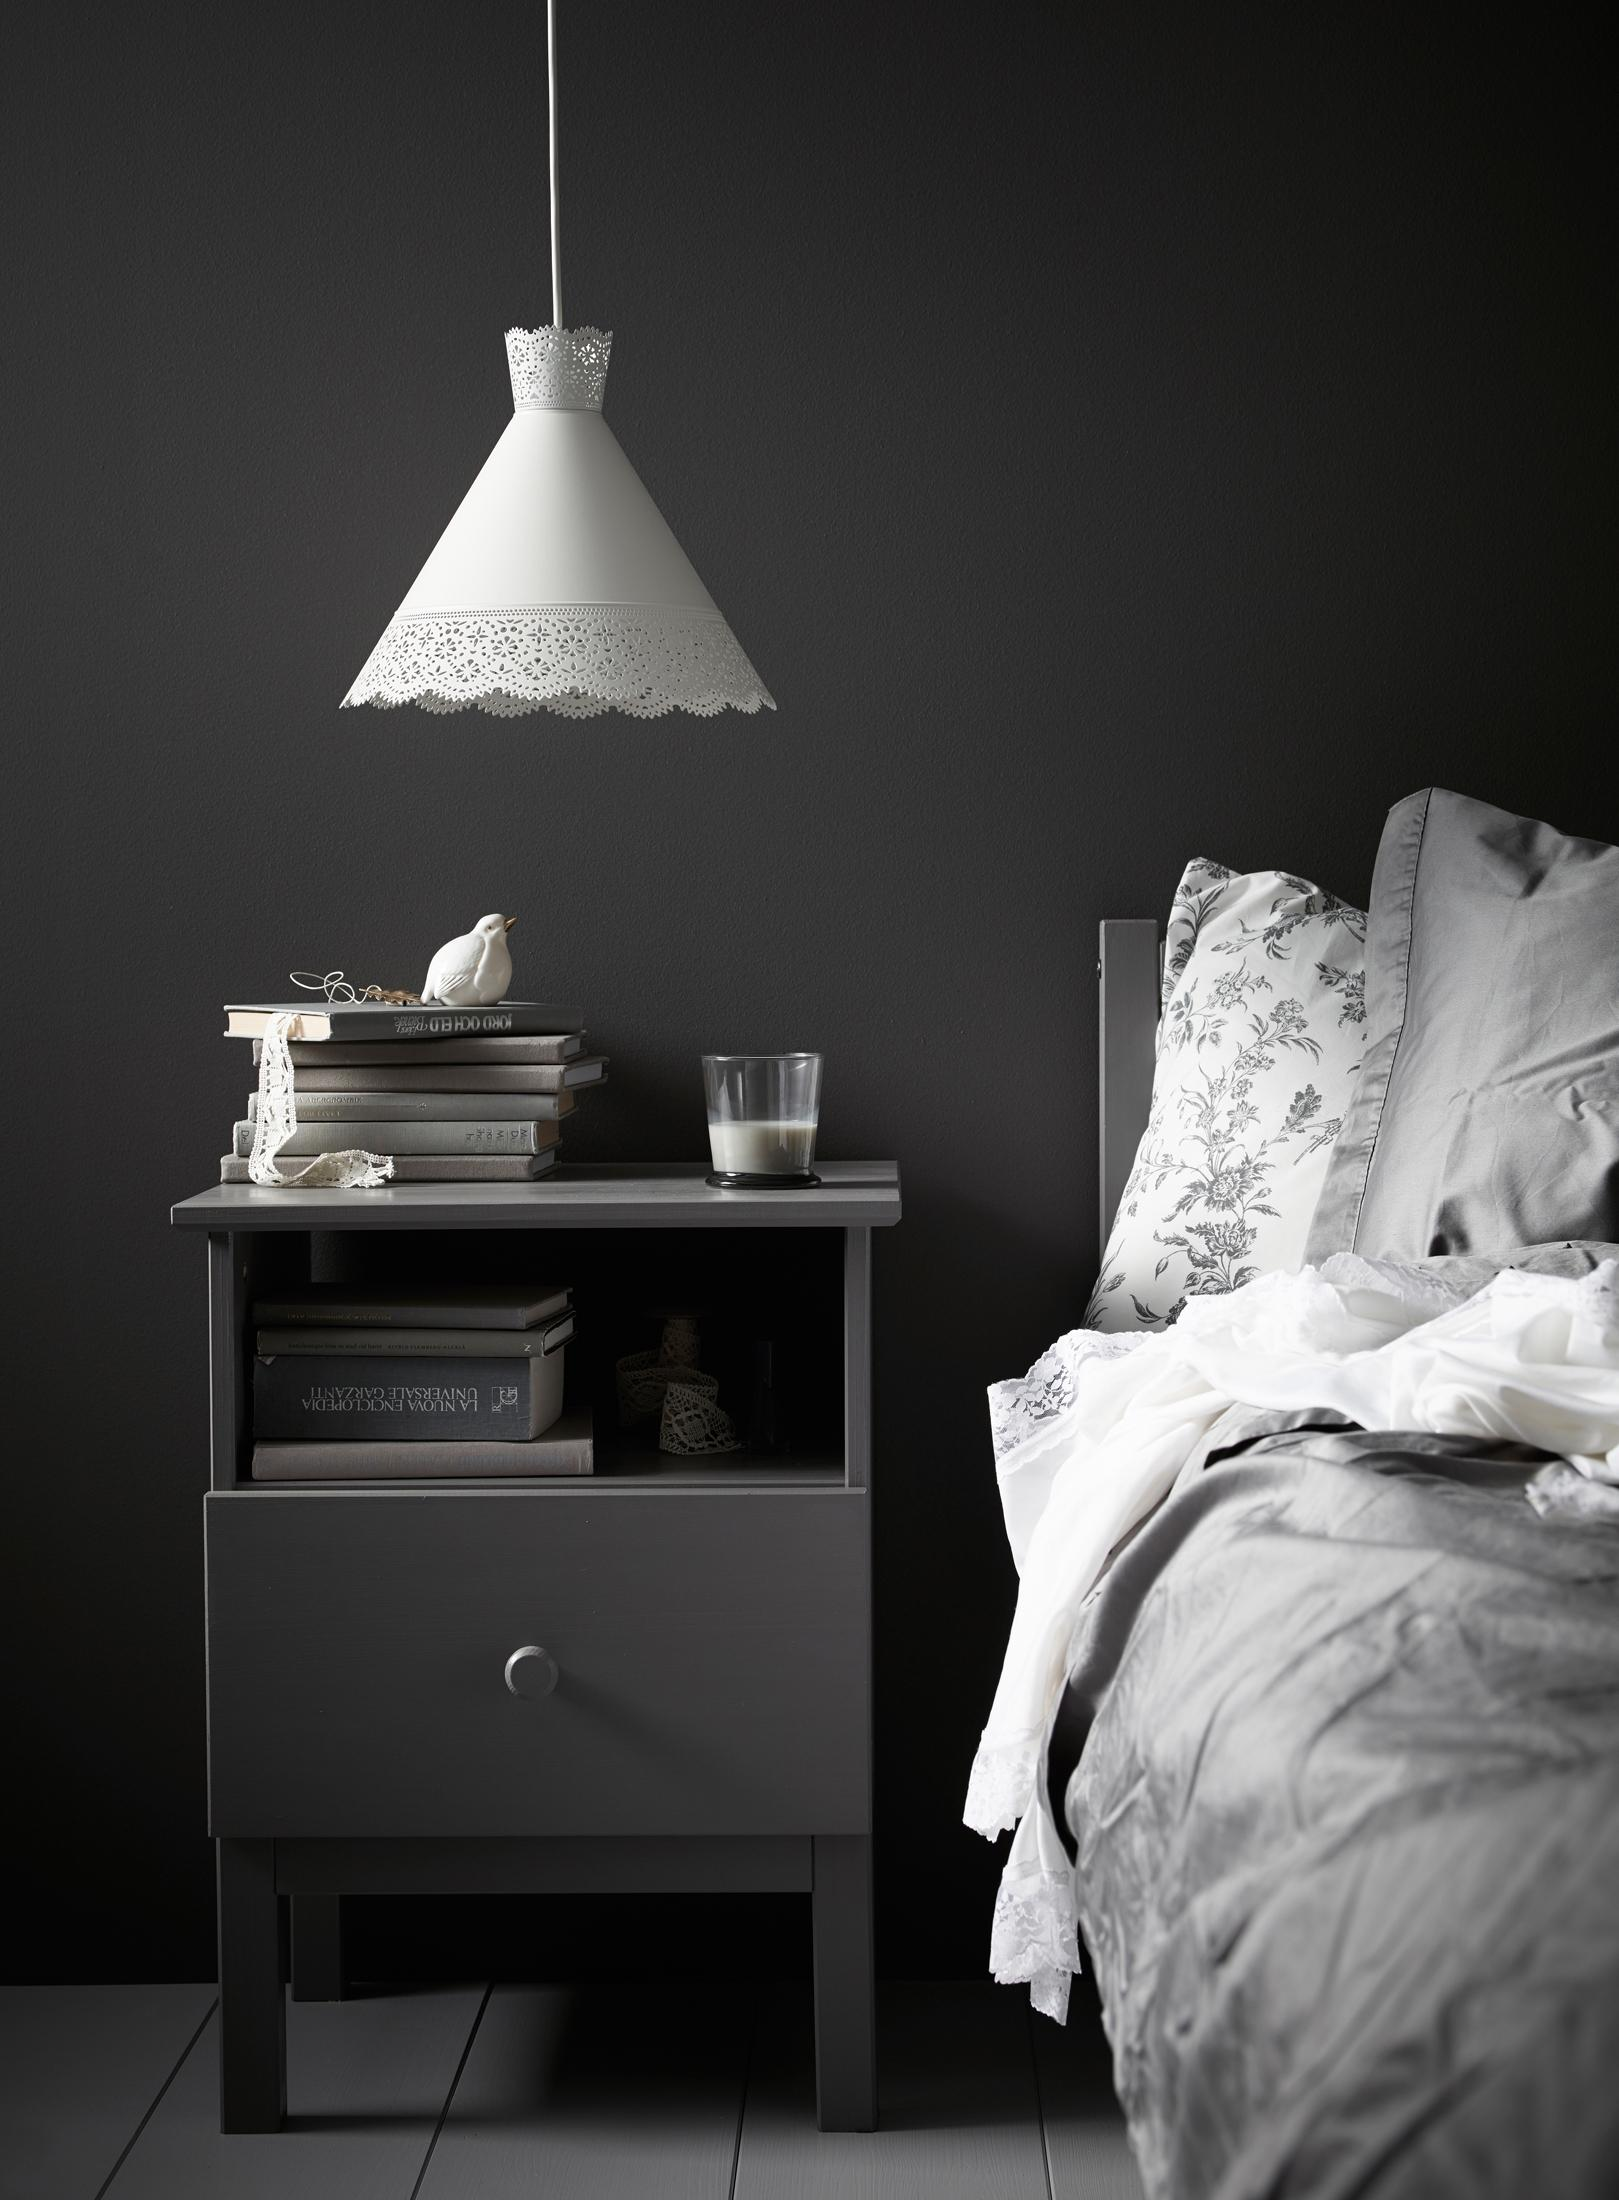 Full Size of Graues Bett Dunkel Samtsofa Ikea Kombinieren 140x200 Bettlaken 160x200 Waschen Passende Wandfarbe 120x200 Einfaches 140 Tojo V Außergewöhnliche Betten Weiß Bett Graues Bett